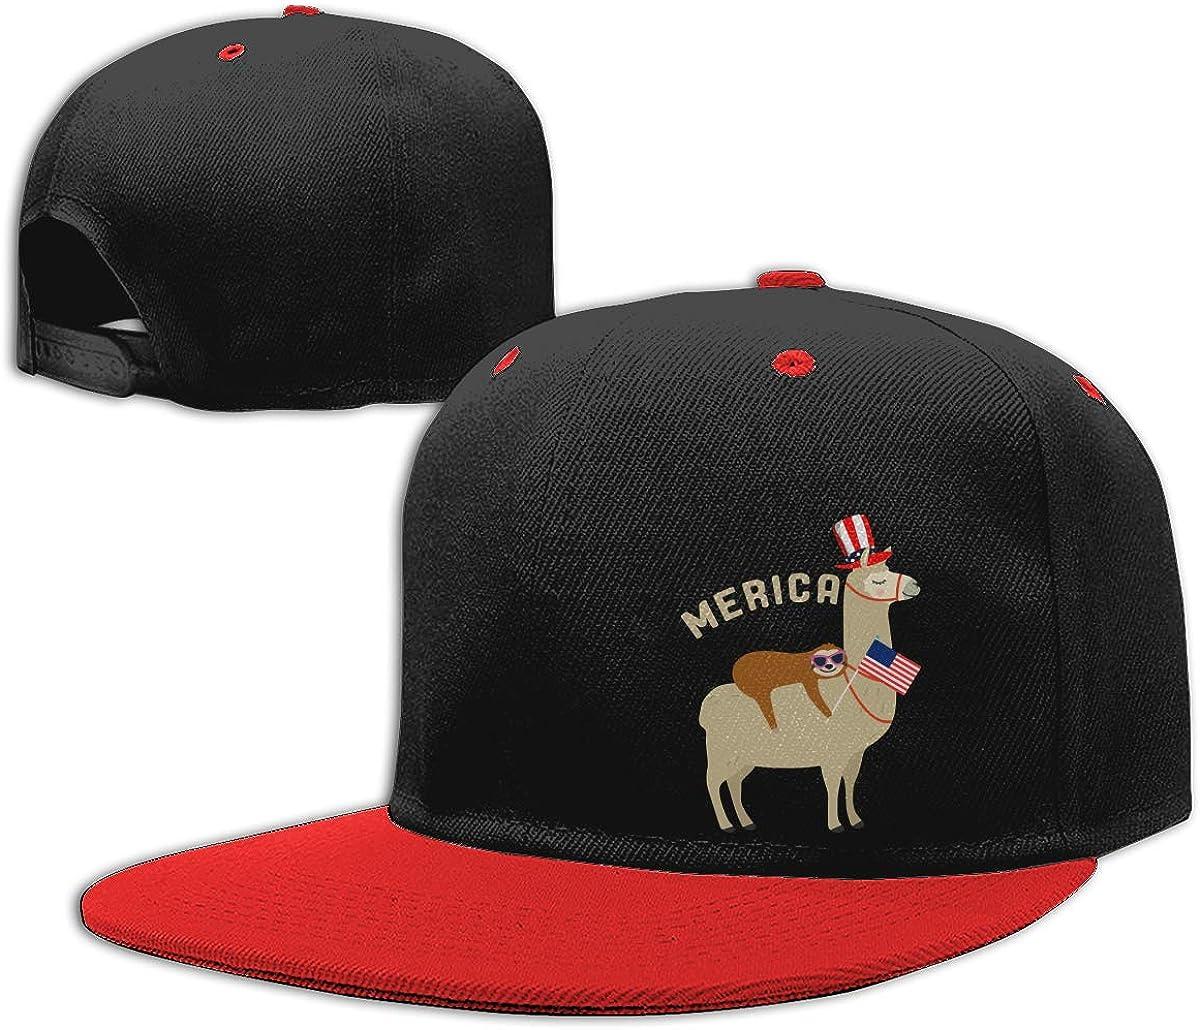 Merica Sloth Riding Llama Printed Hip-Hop Baseball Caps NMG-01 Men and Women Snapback Cap